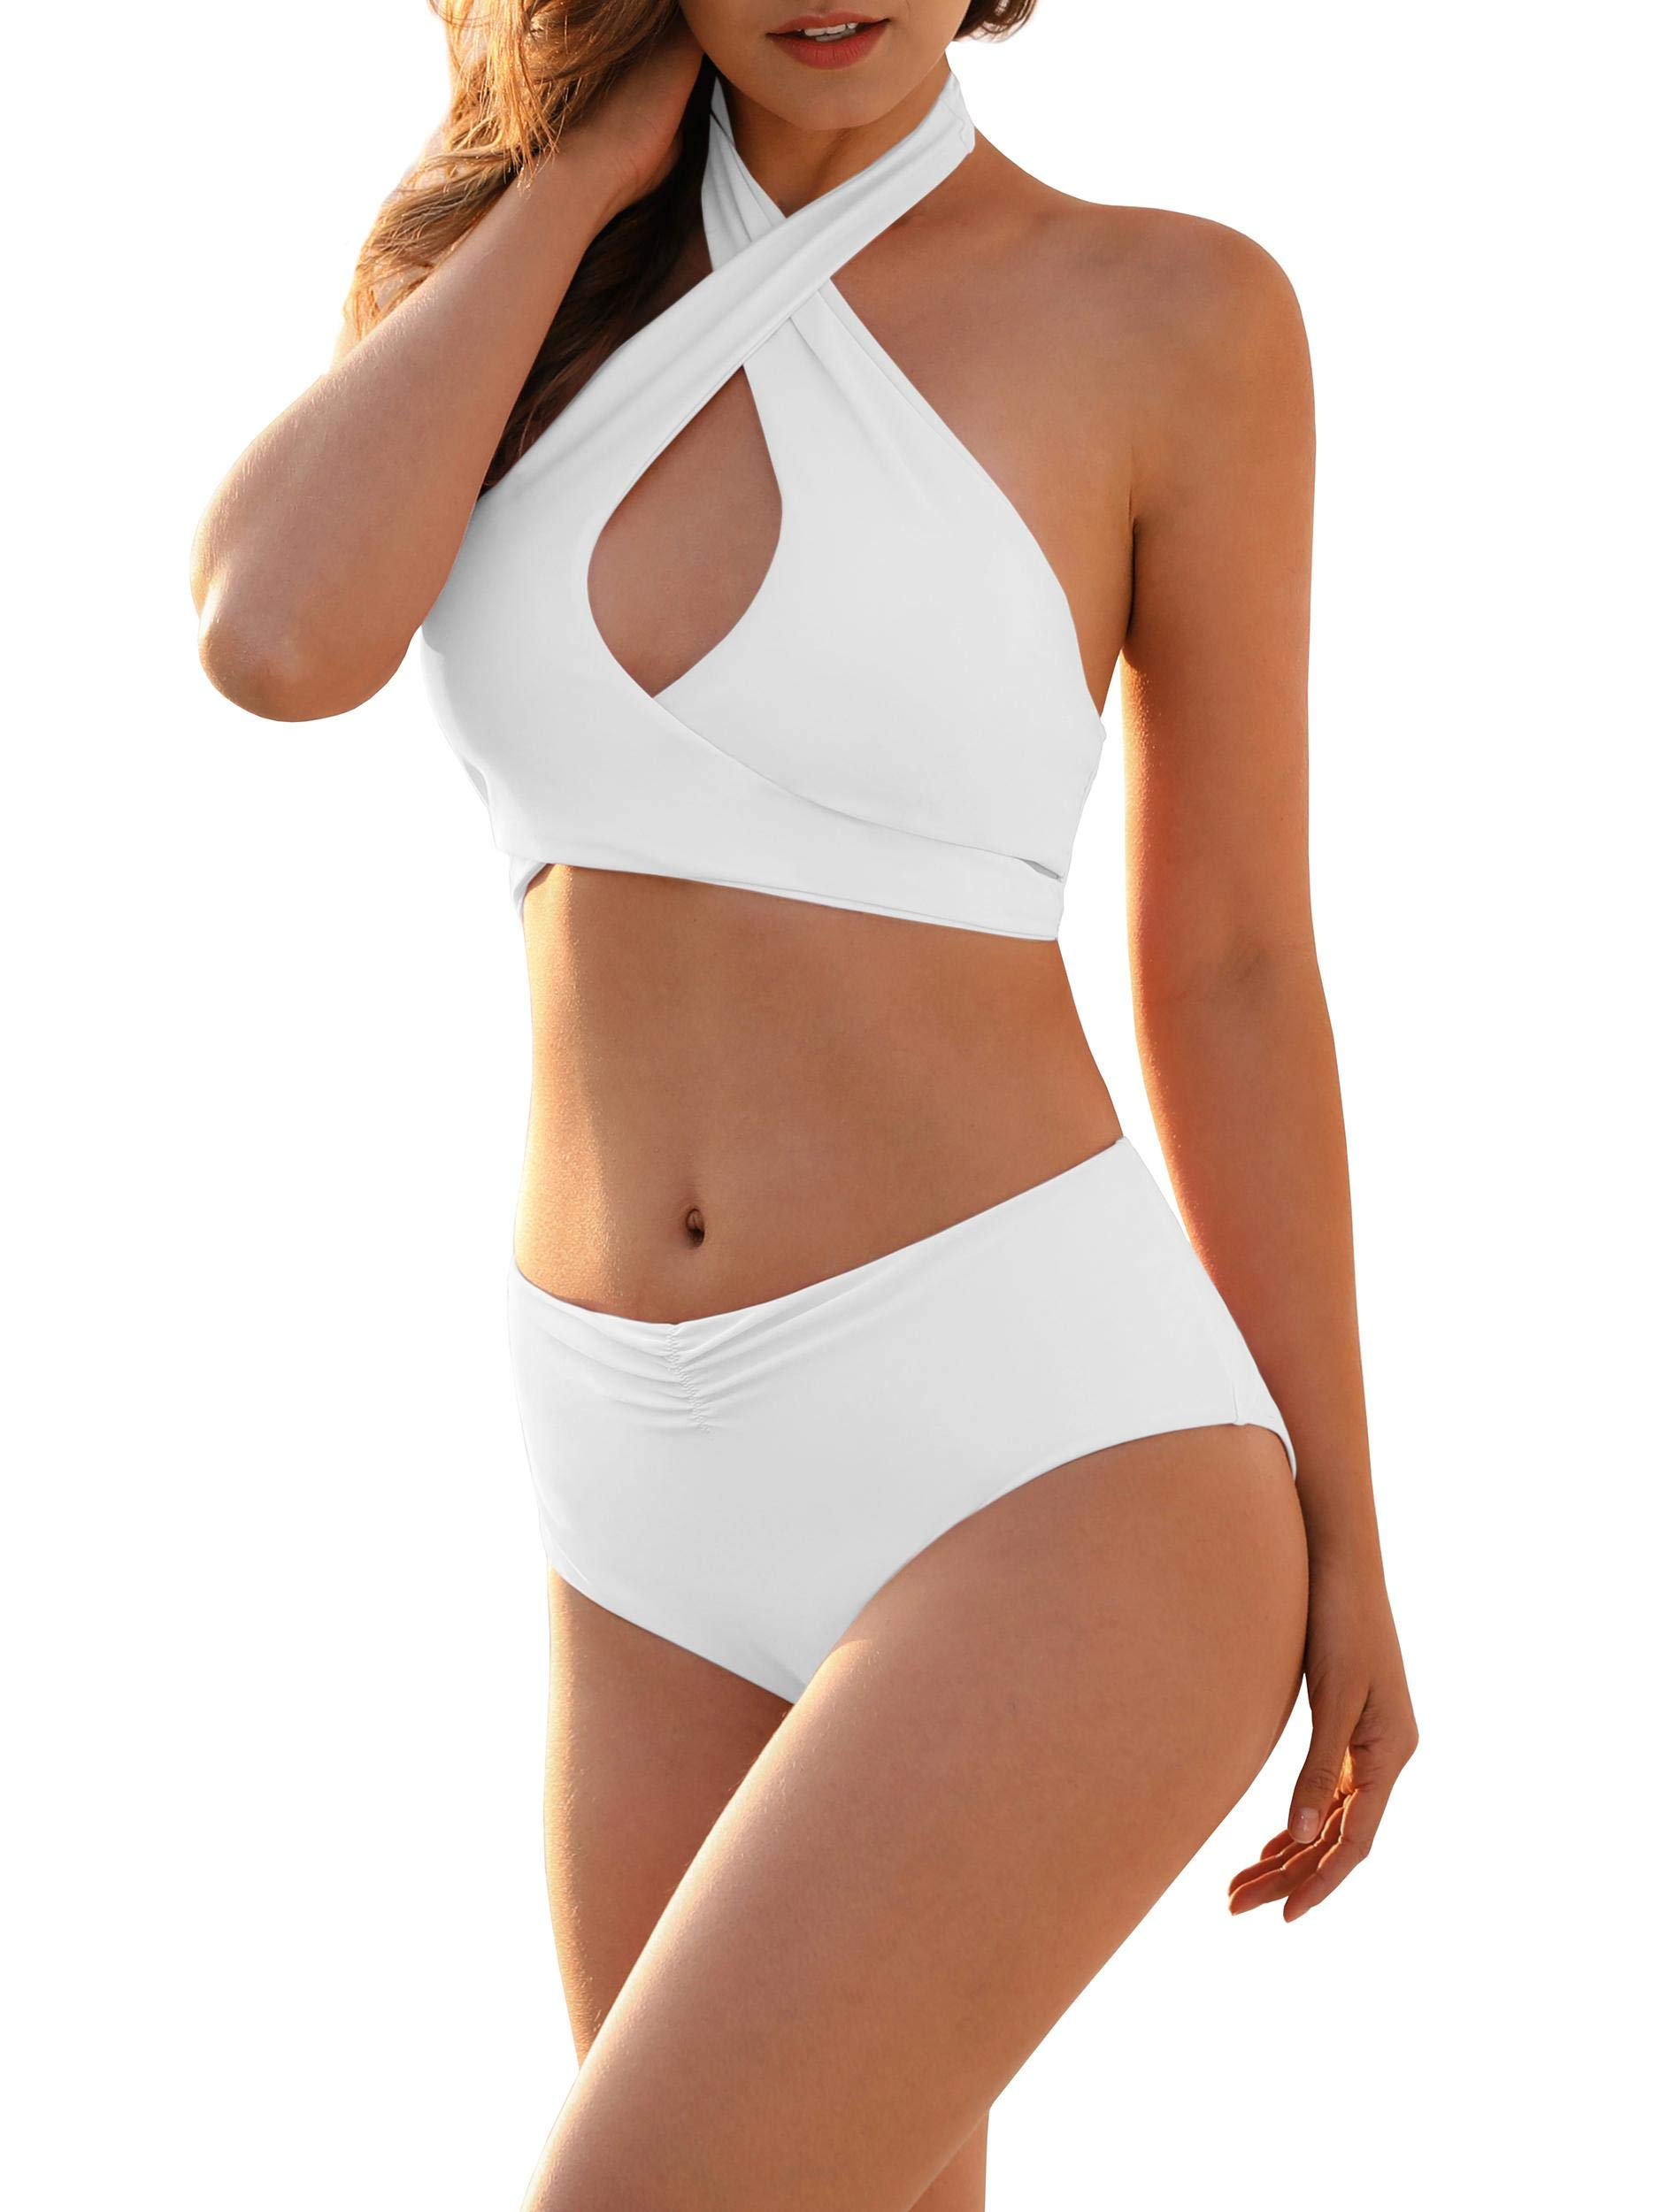 Imily Bela Womens Vintage High Waisted Bikini Sets 2 Pieces Sexy Criss Cross Swimsuits